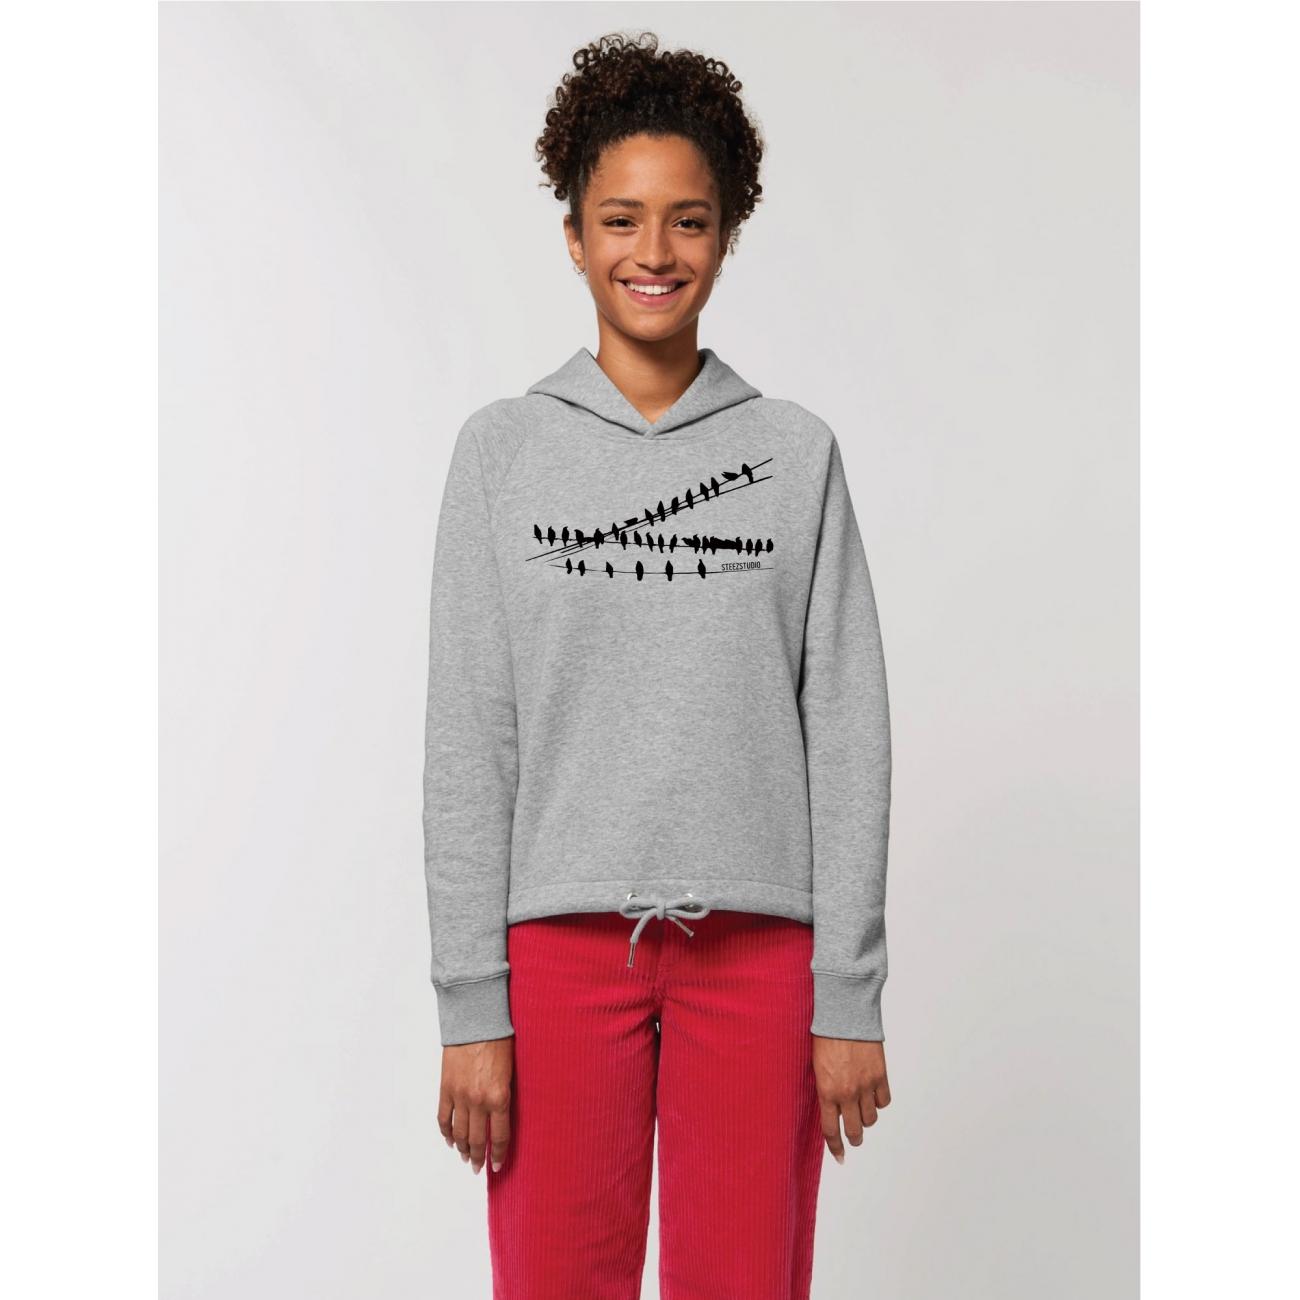 https://tee-shirt-bio.com/8876-thickbox_default/sweat-court-a-capuche-femme-coton-bio-gris-clair-chine.jpg